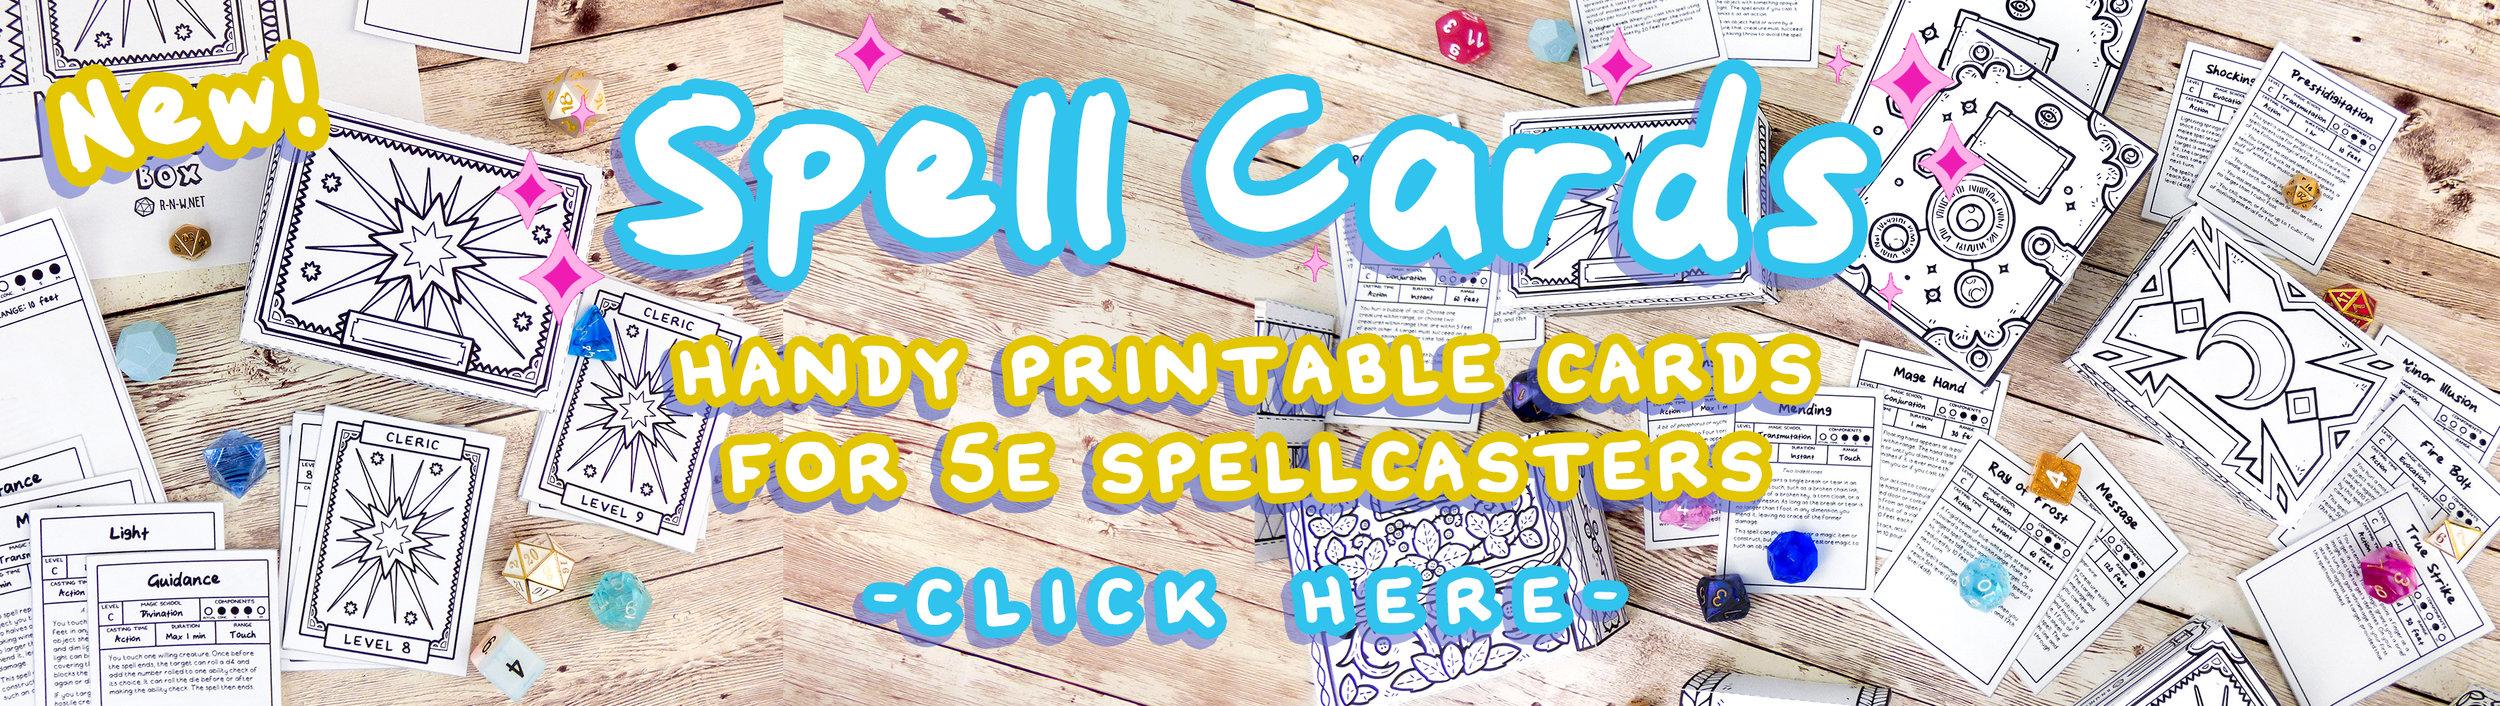 SPELL CARDS BANNER AD 3.jpg